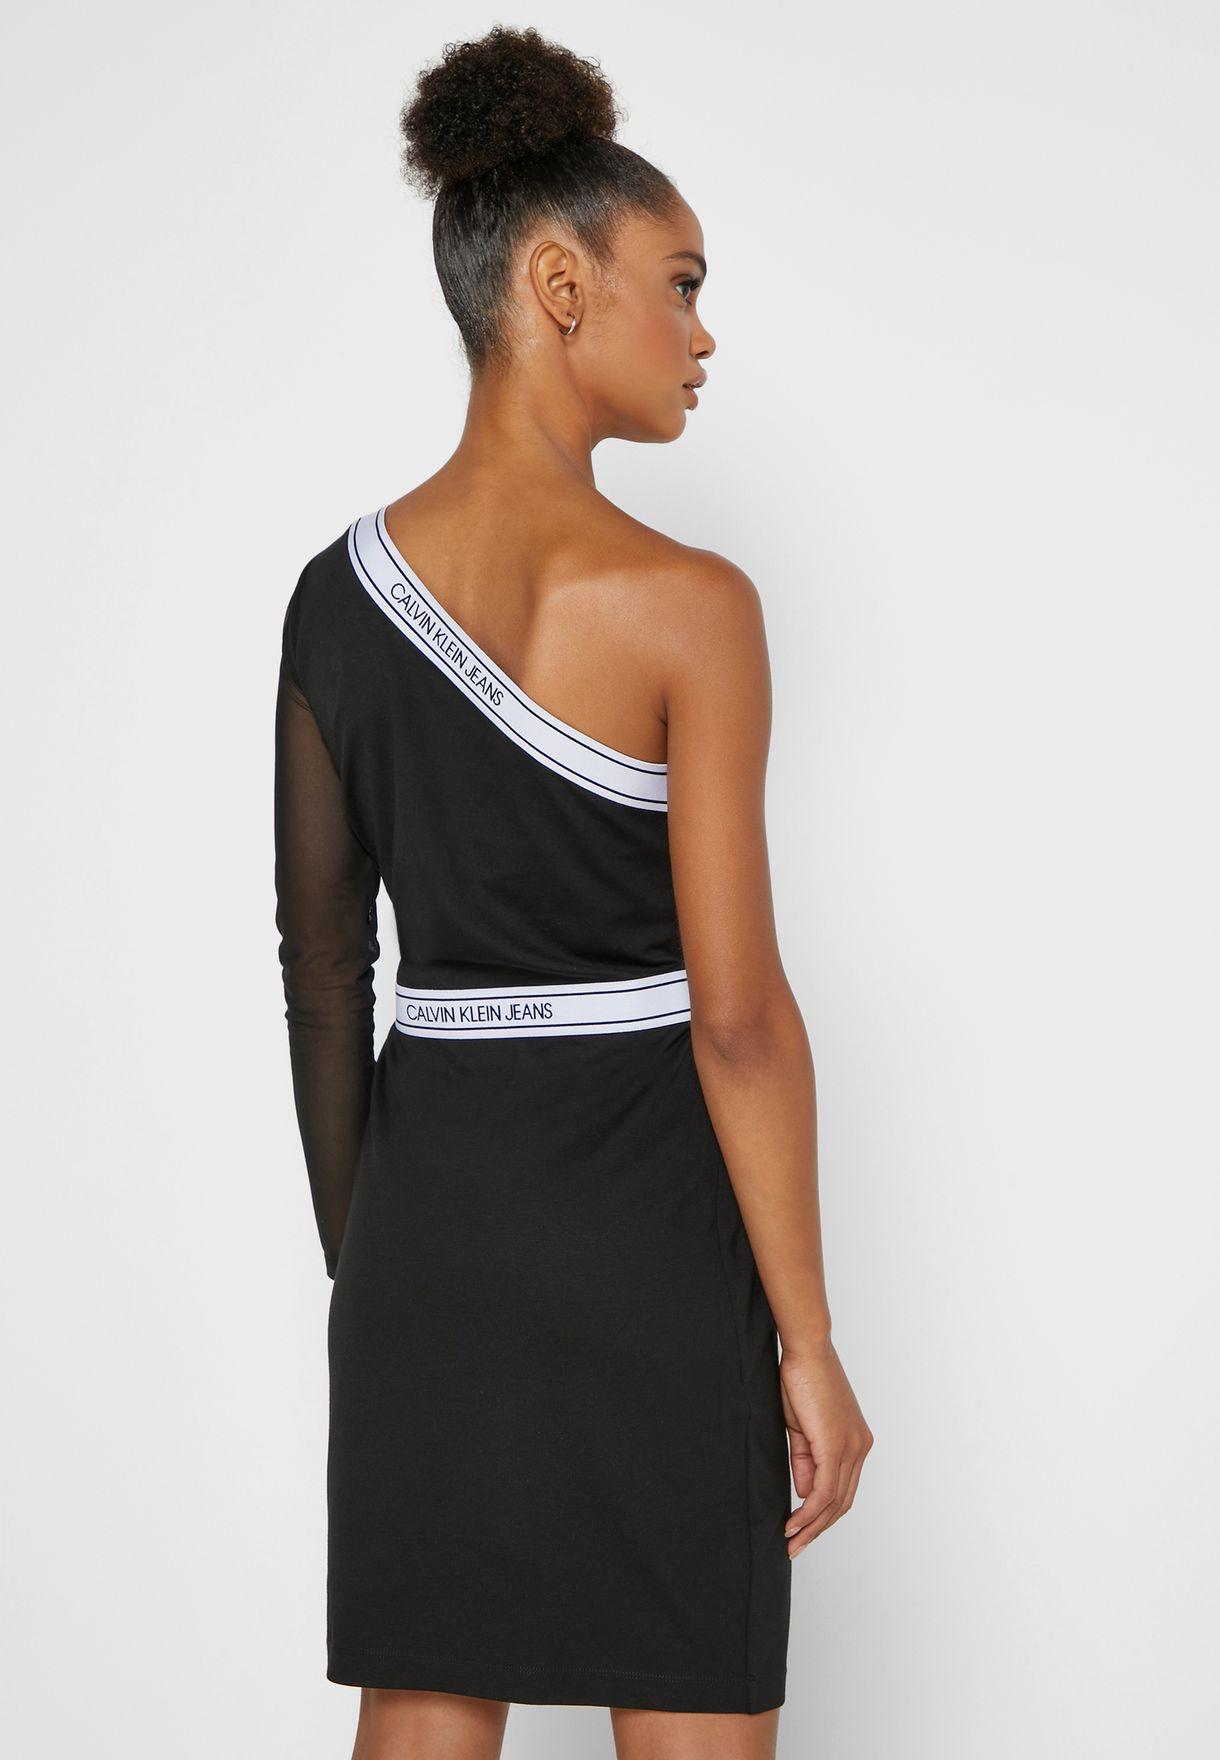 فستان بكتف واحد وكم طويل